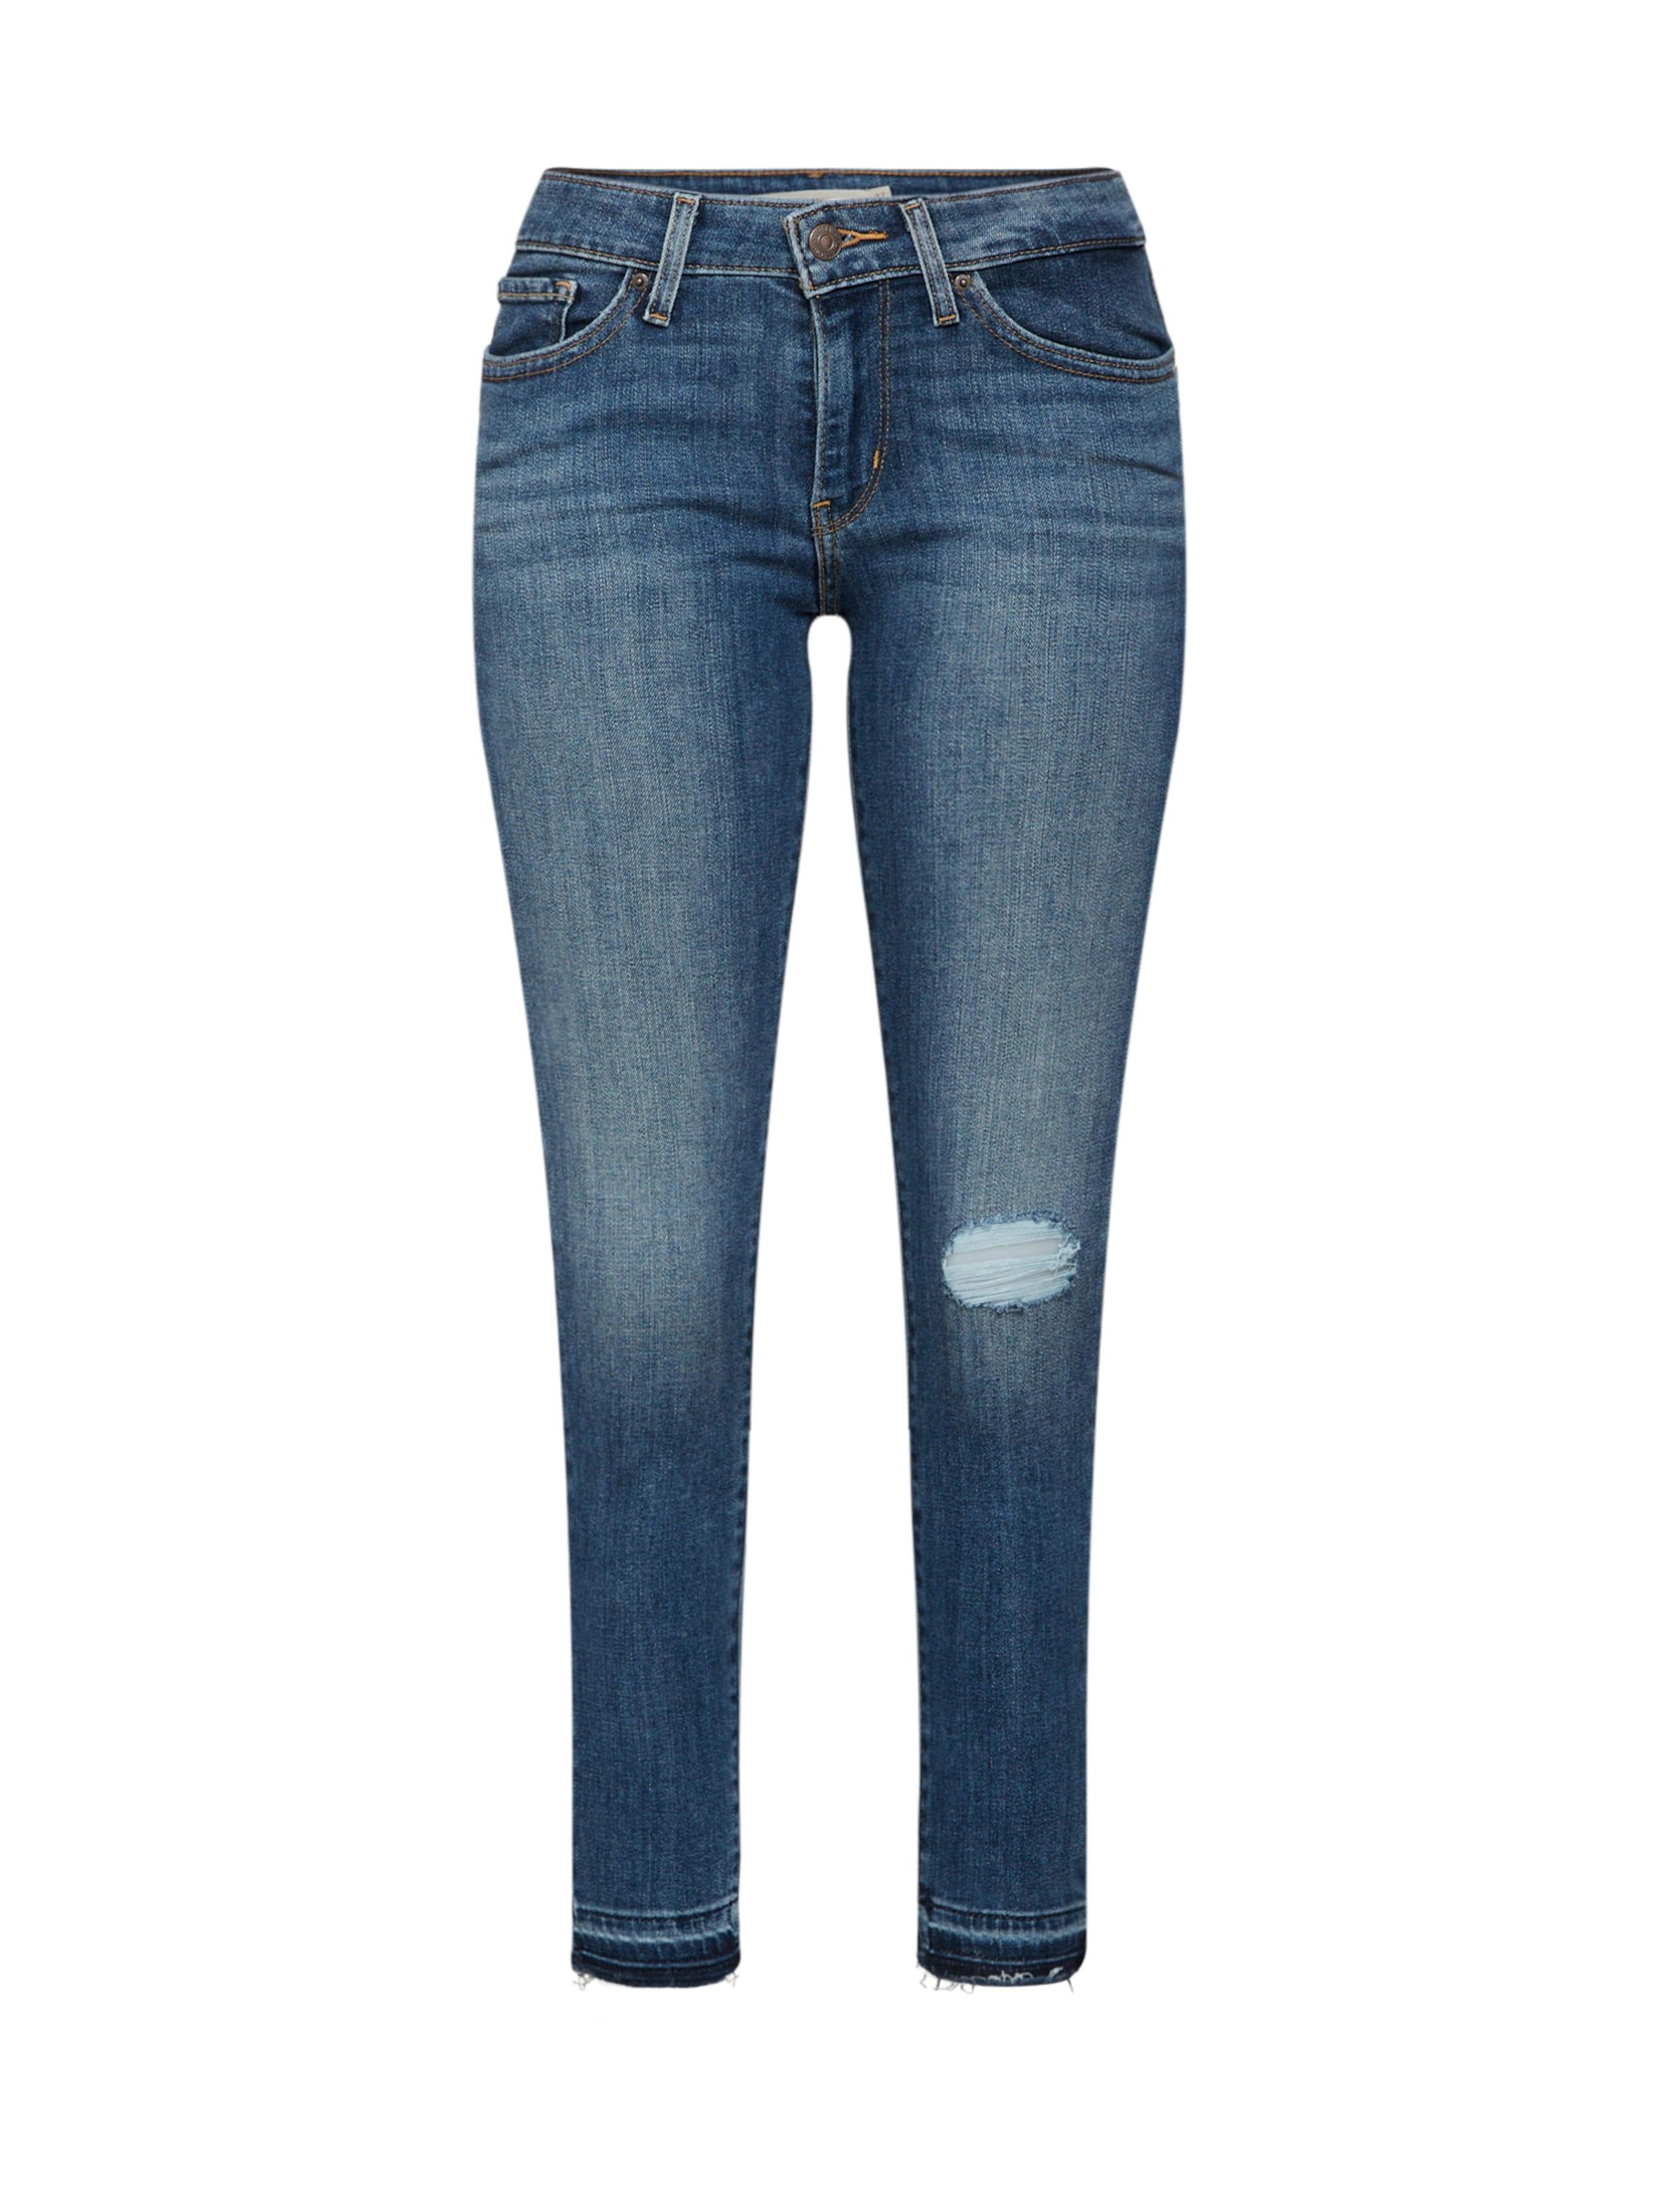 Denim Levi's Skinny Jean Bleu '711 En Ankle' lFKT1cJ